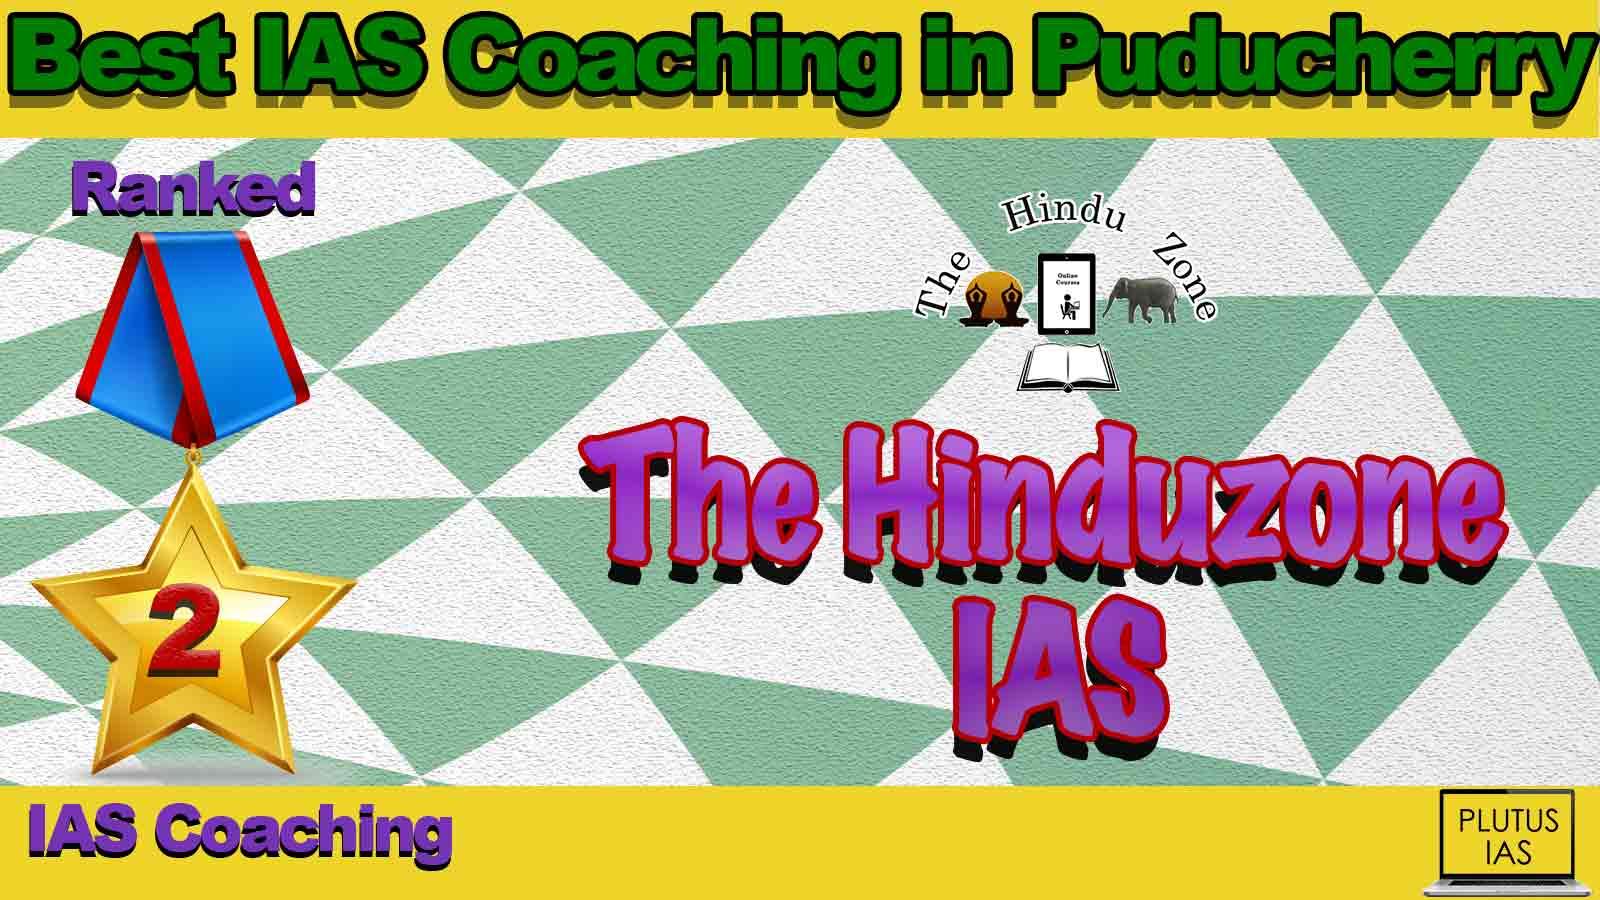 Best IAS Coaching in Chhattisgarh